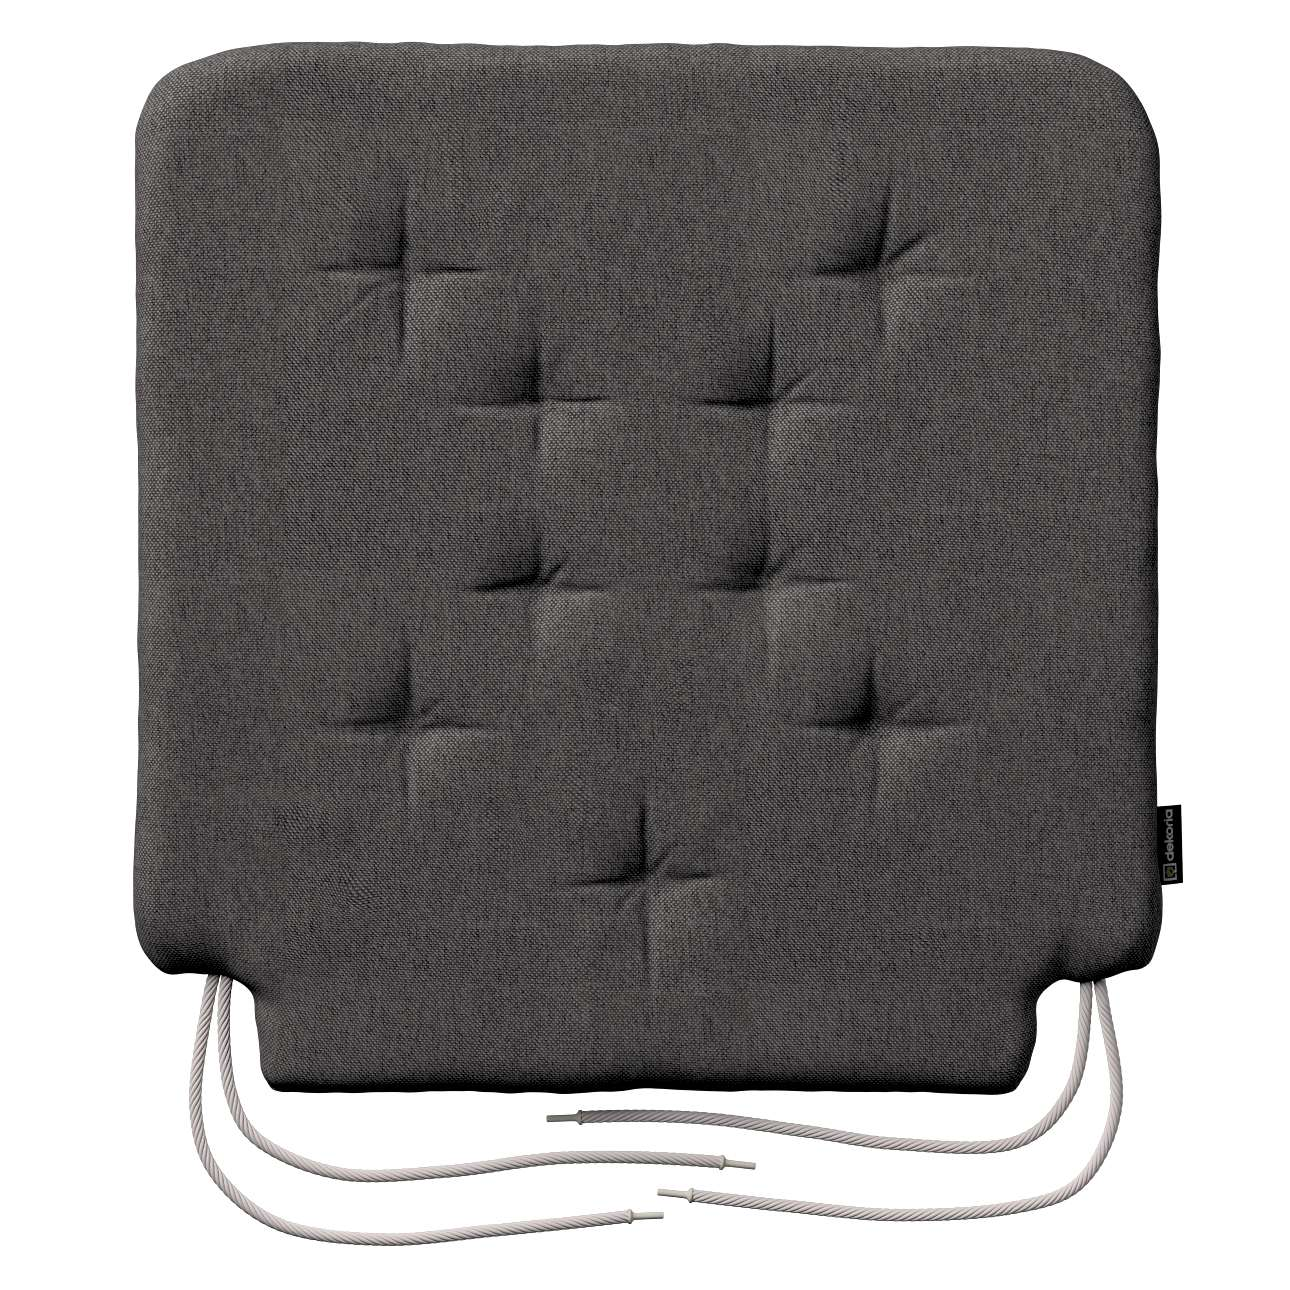 Kėdės pagalvėlė Olek  42 x 41 x 3,5 cm kolekcijoje Etna , audinys: 705-35